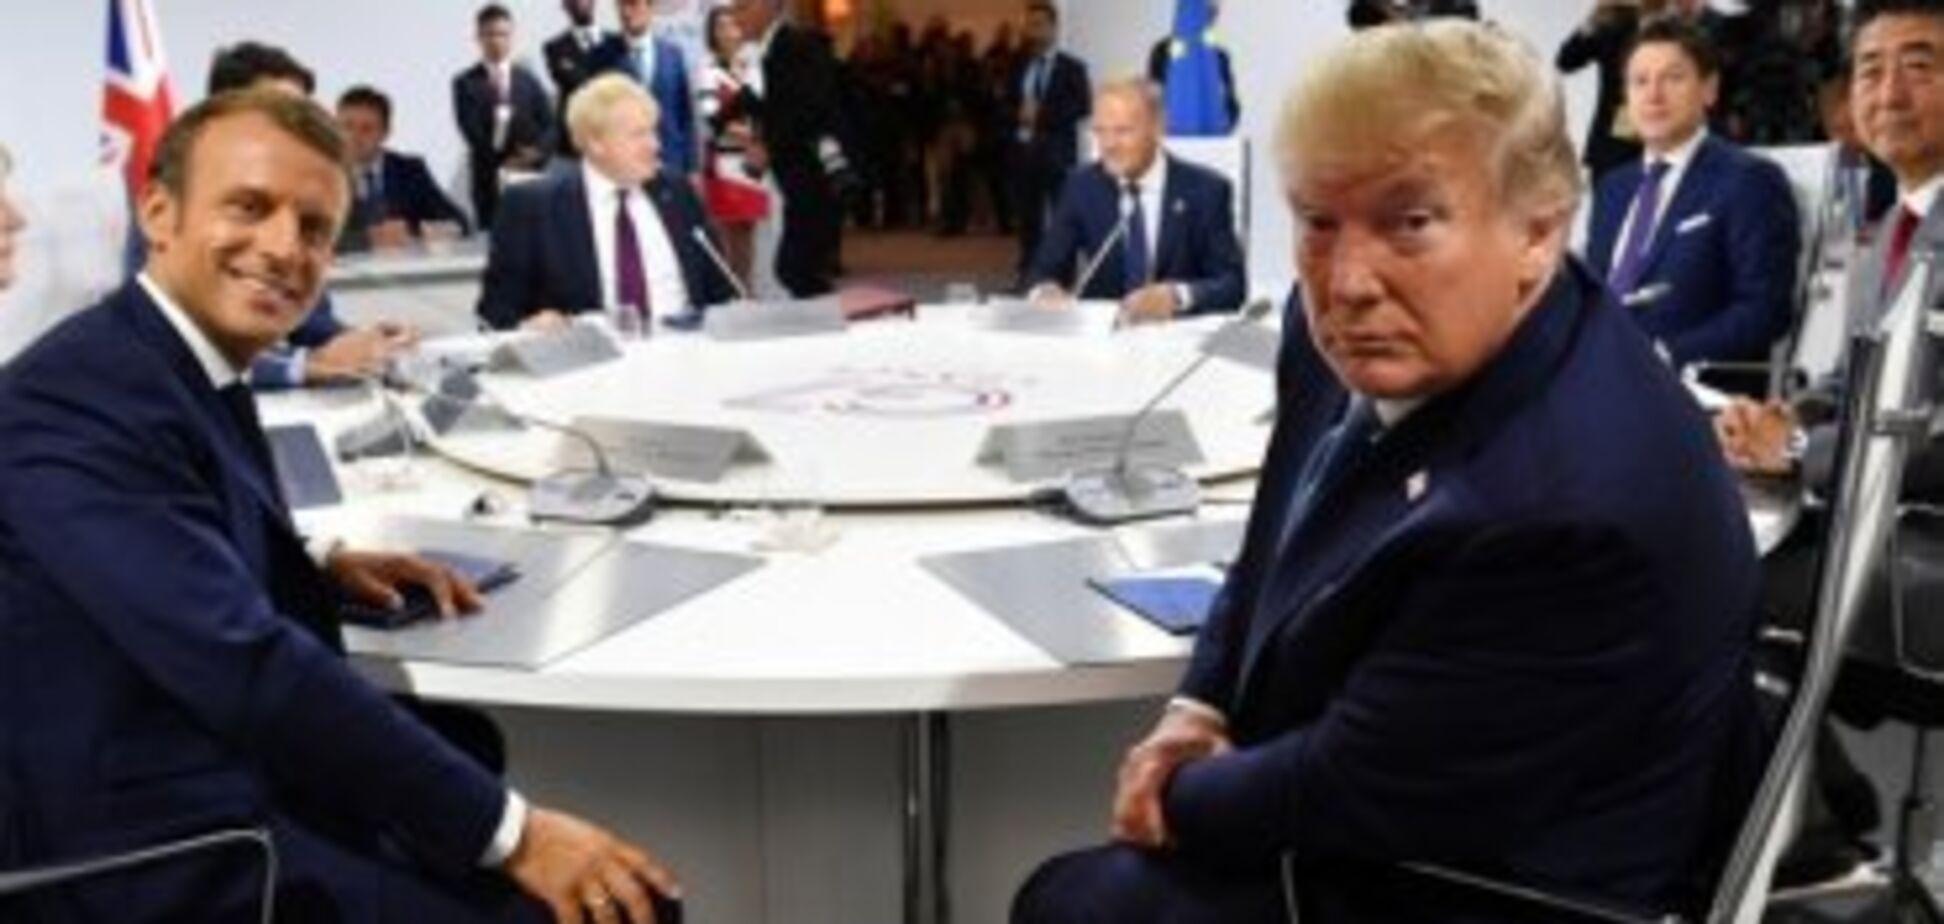 Не пригласили: в G7 резко отшили Путина и получили ответ